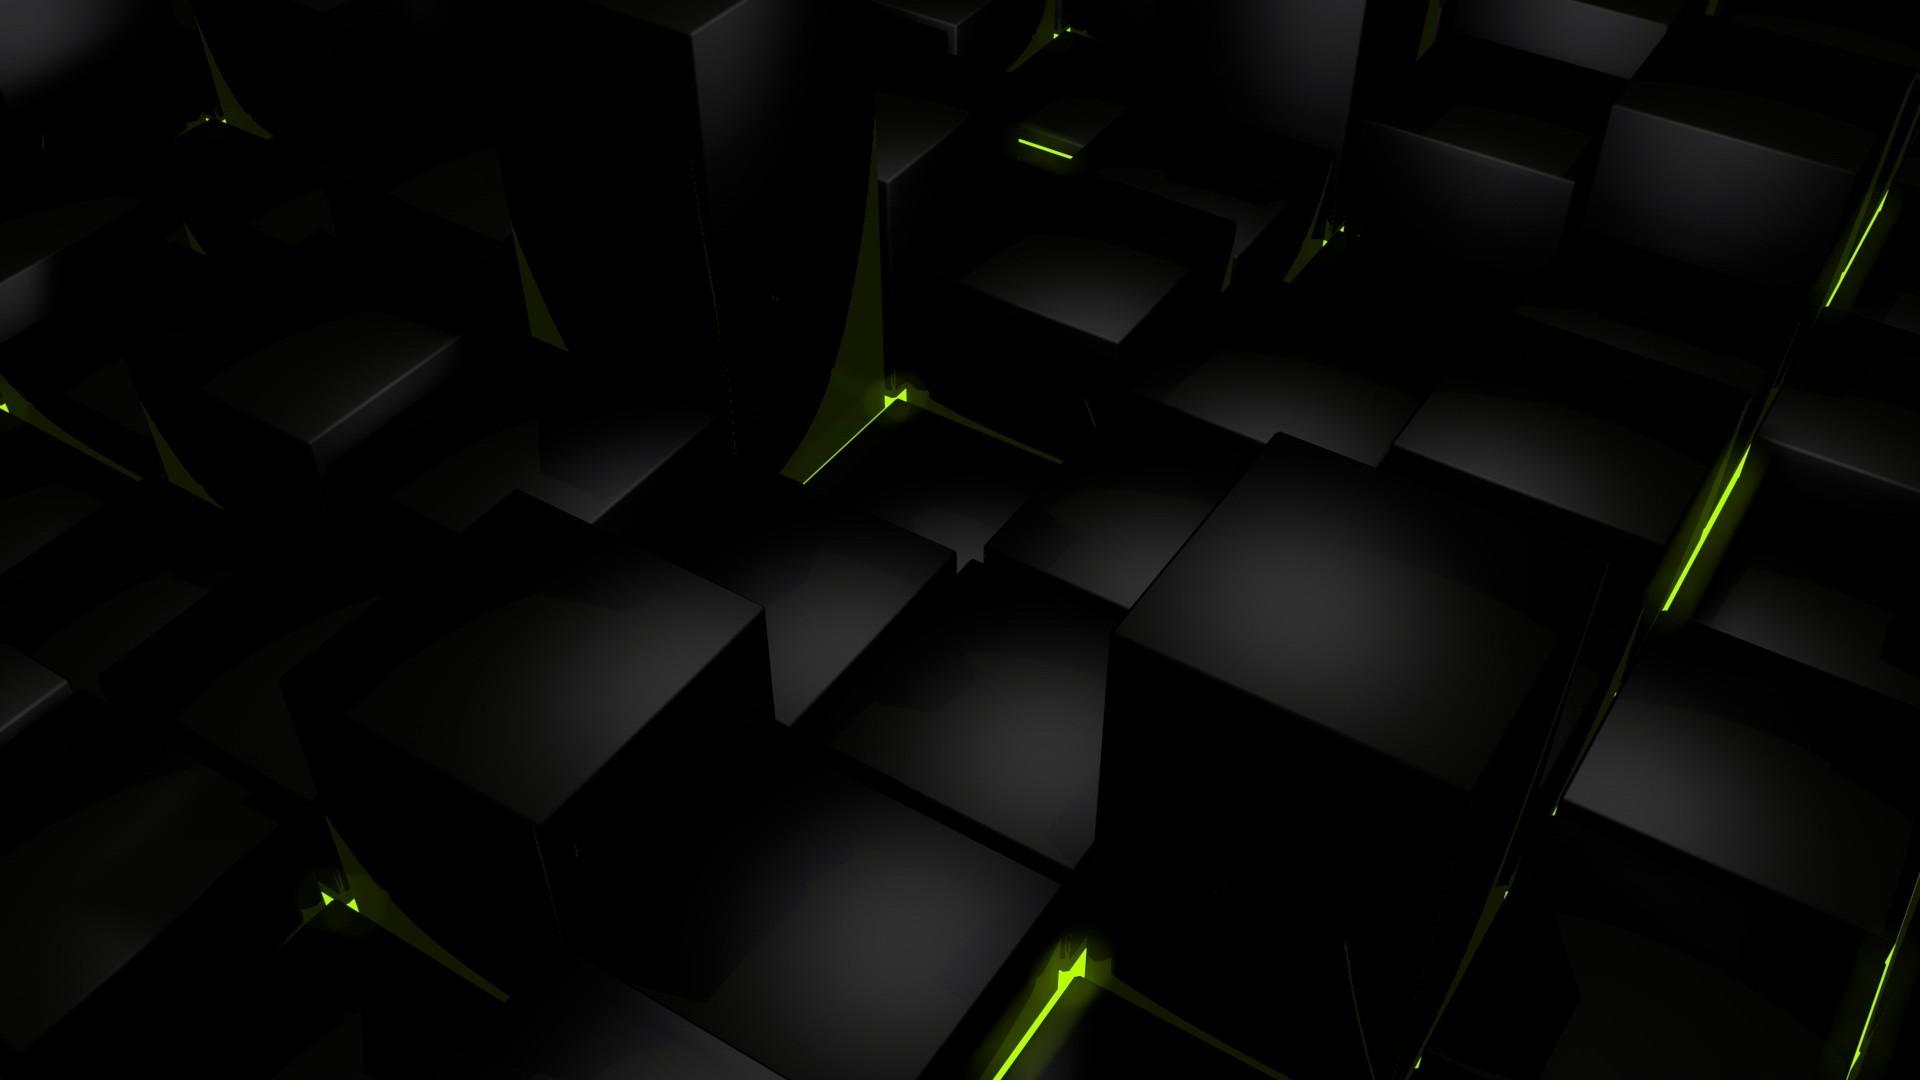 Full HD p Space Wallpapers Desktop Backgrounds HD Downloads